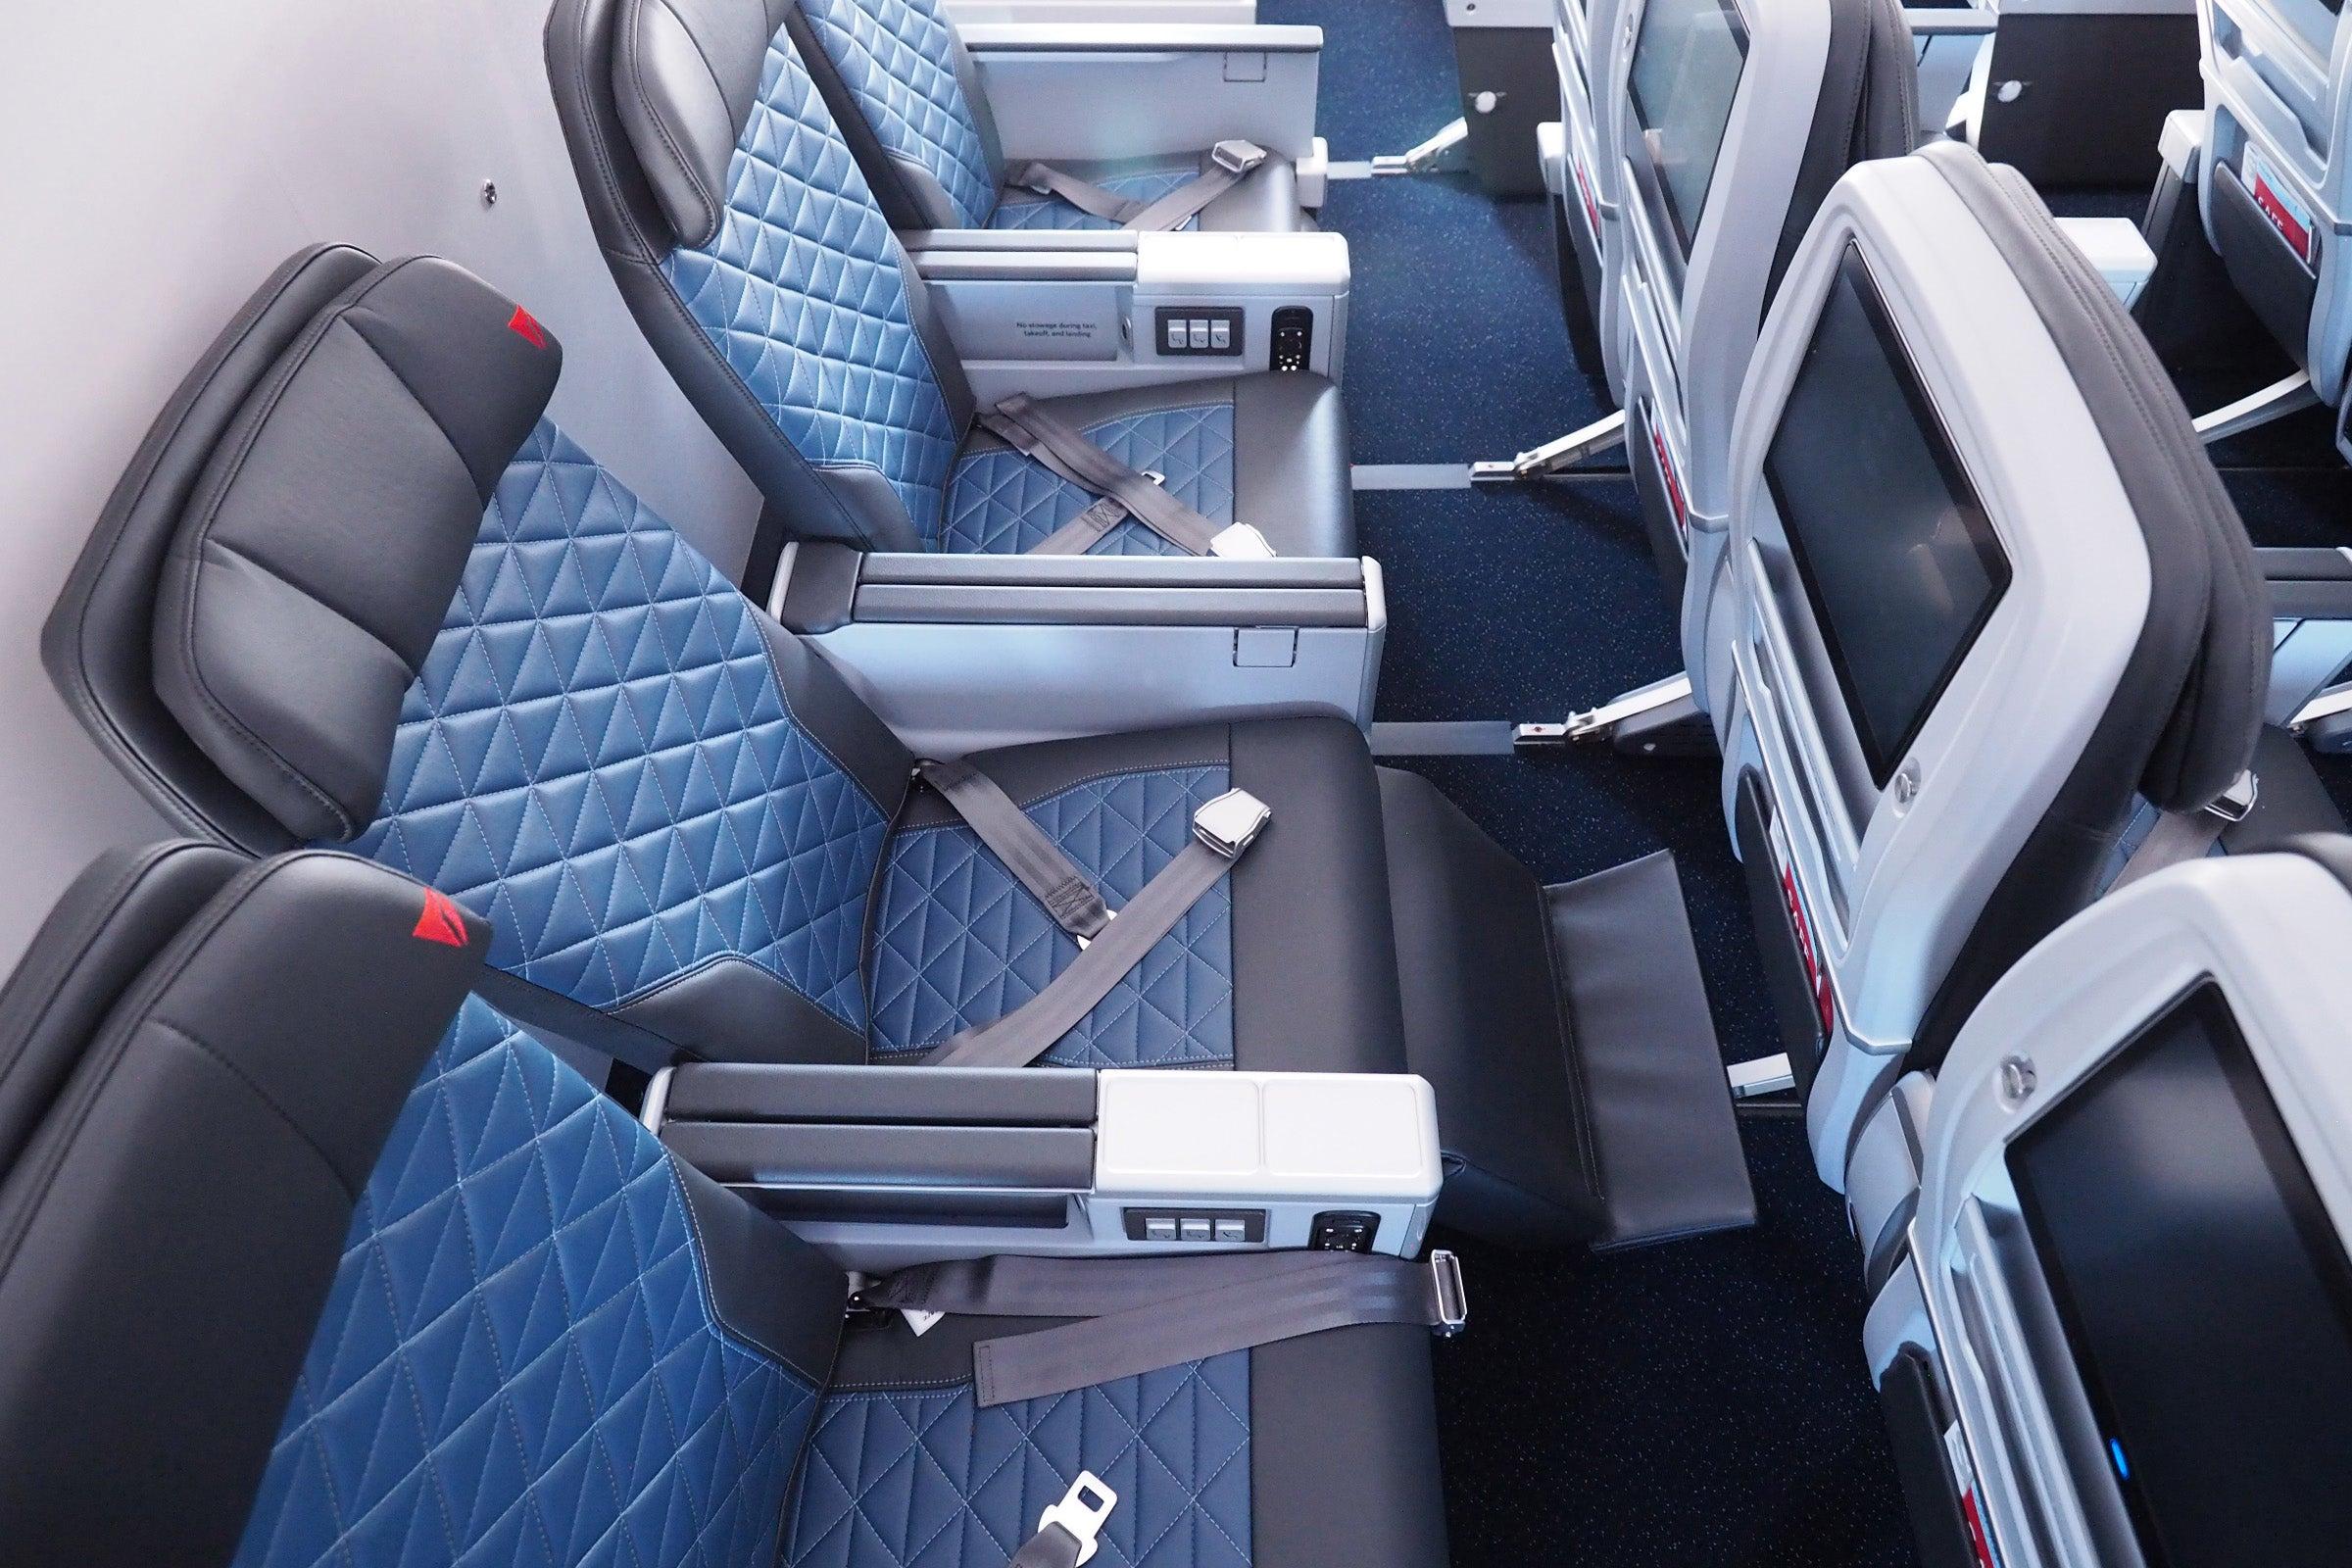 Delta Preferred Seat Nice Houzz